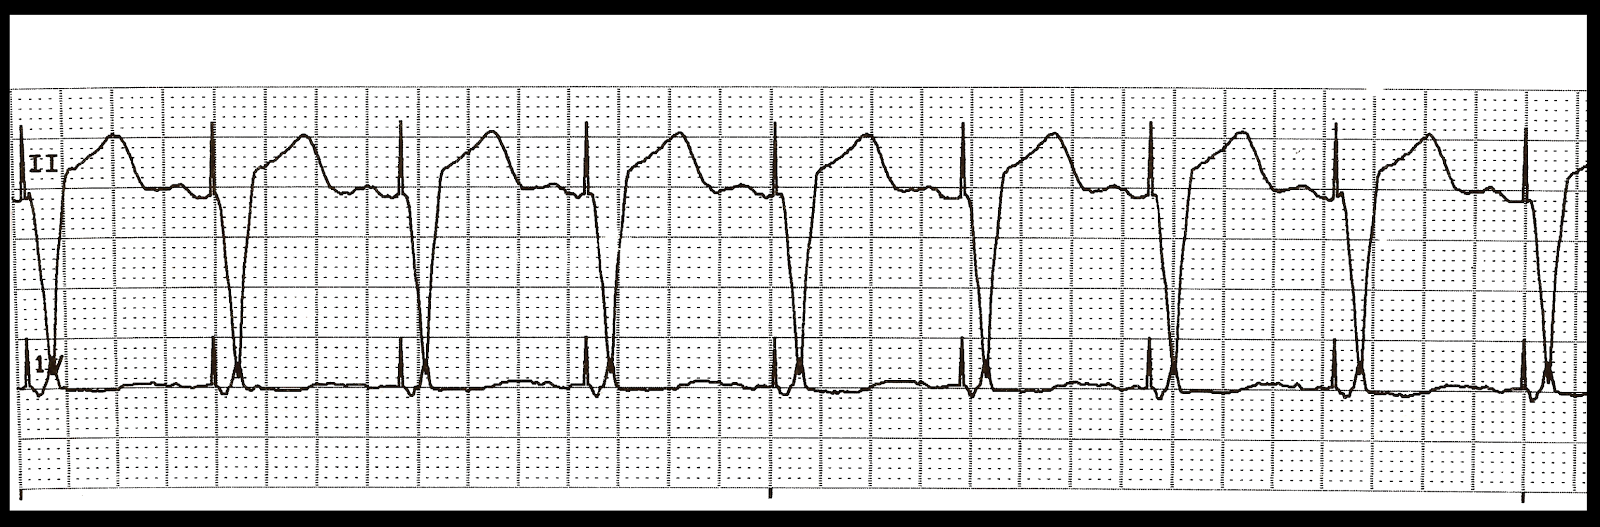 biventricular pacing for atrioventricular block and - 1600×527